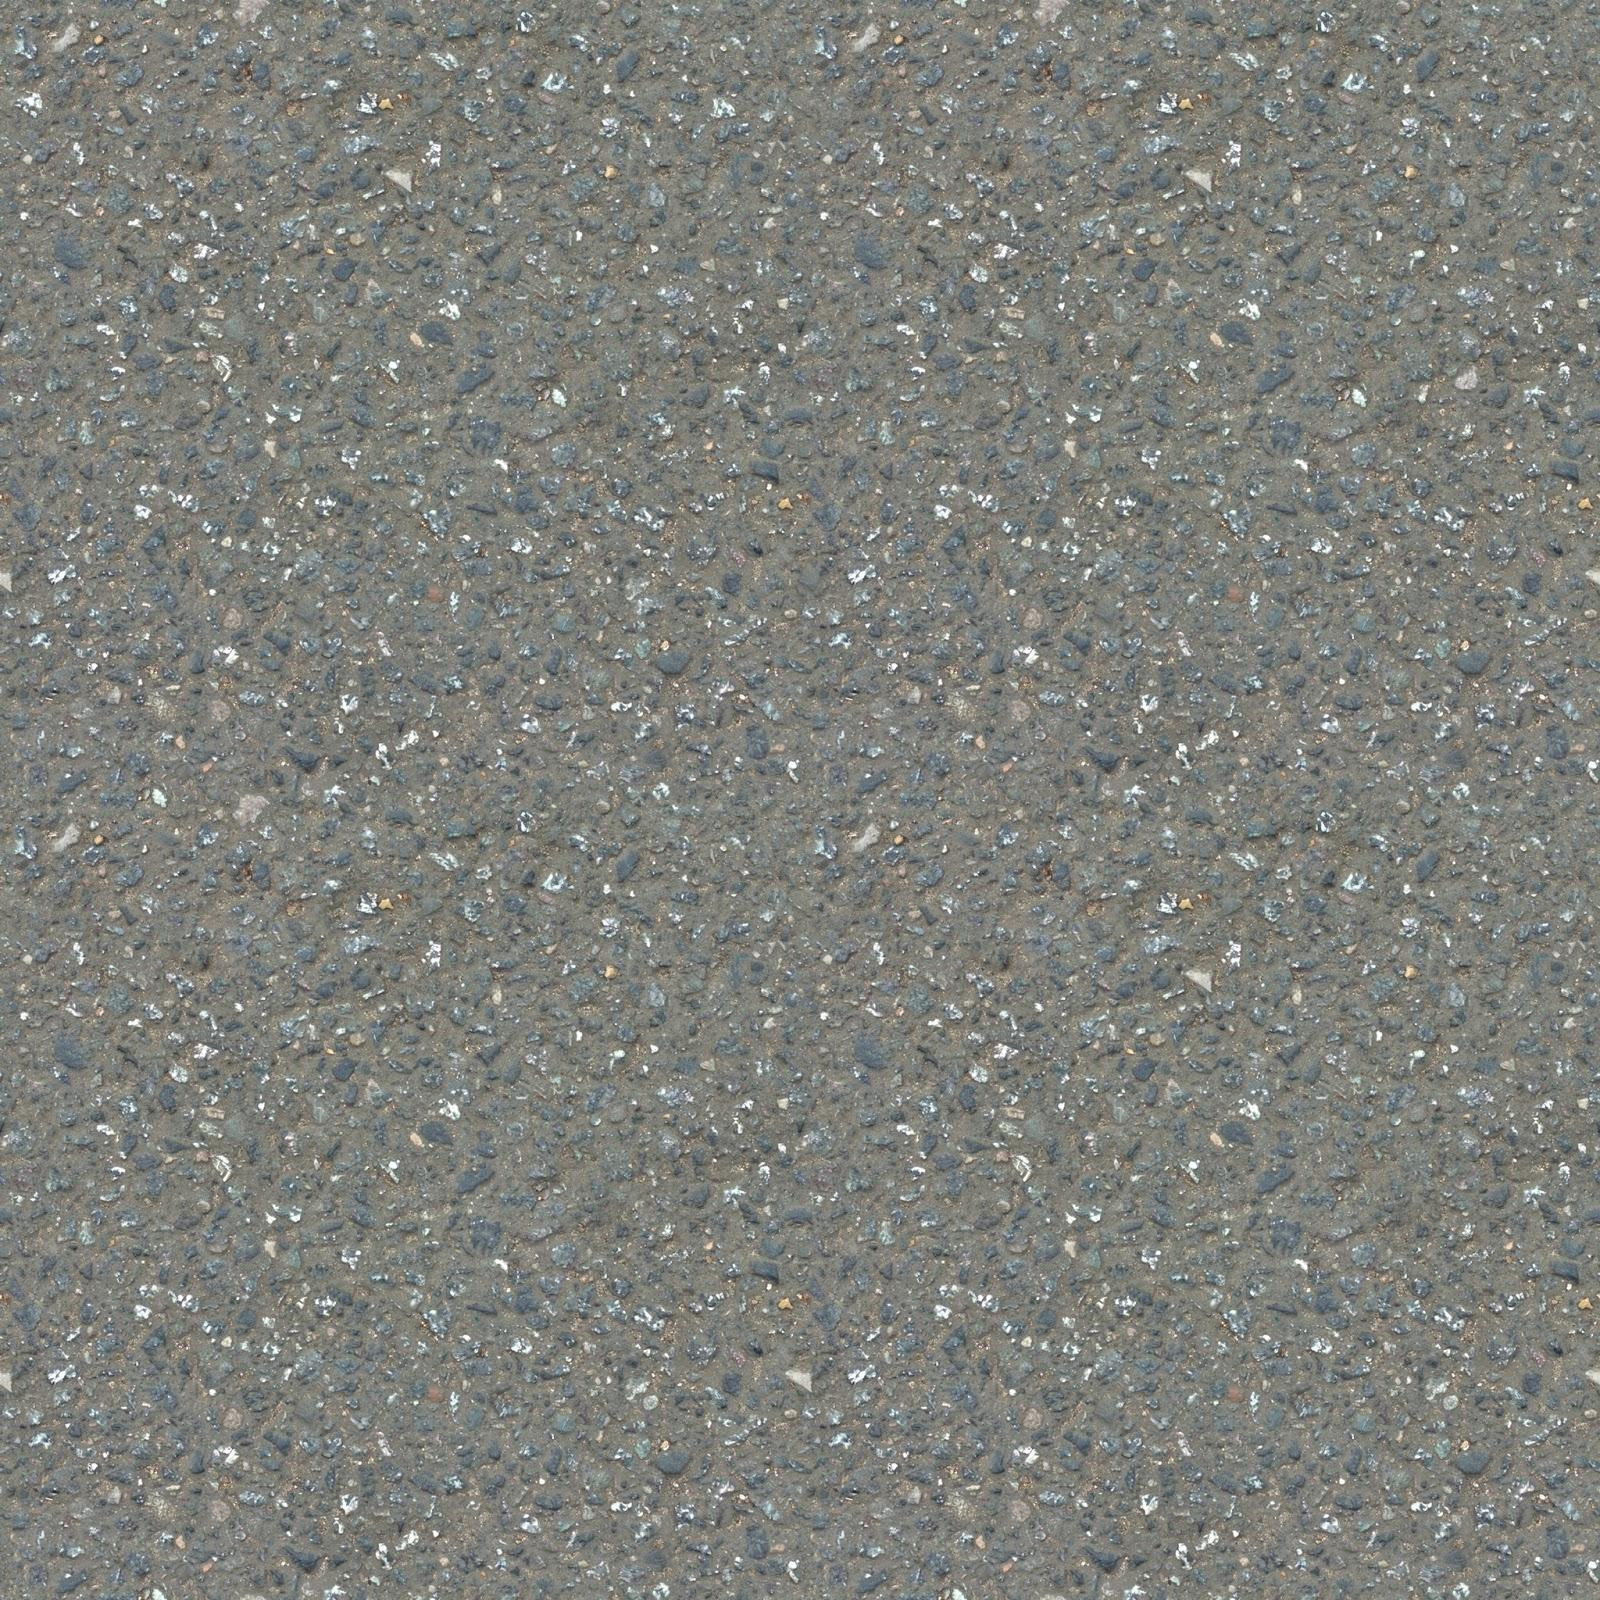 (CONCRETE 17) seamless floor granite stones texture 2048x2048